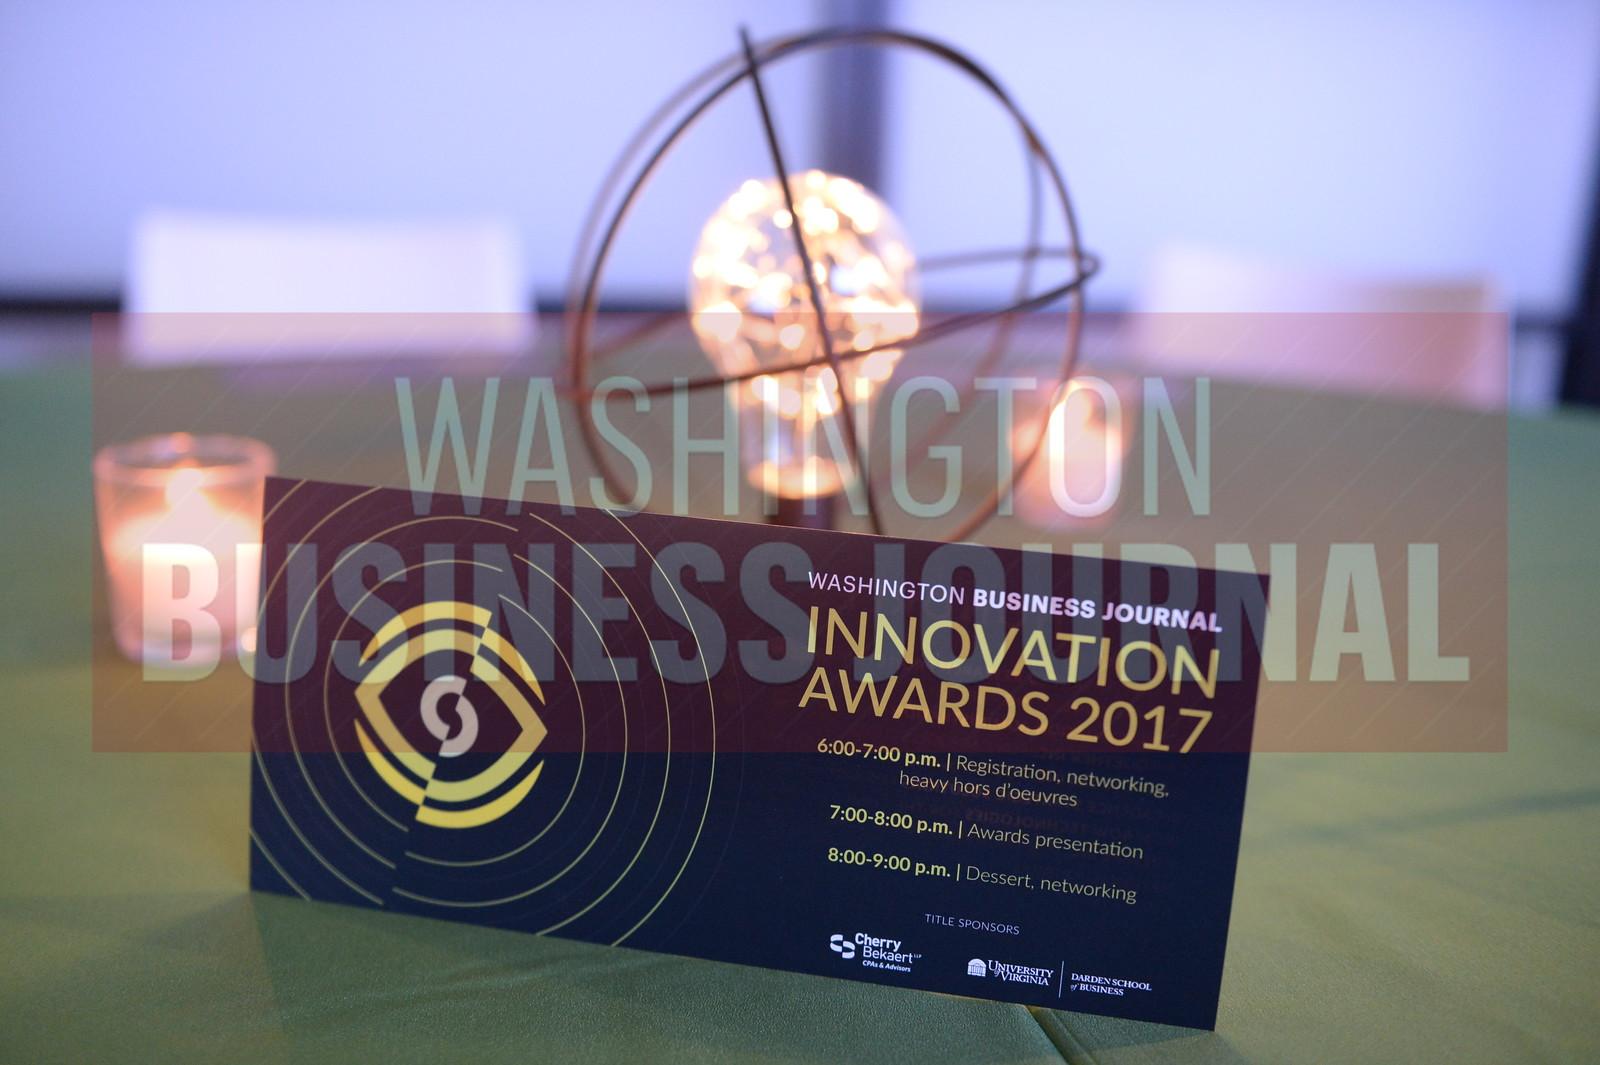 Washington Business Journal Innovation Awards 2017